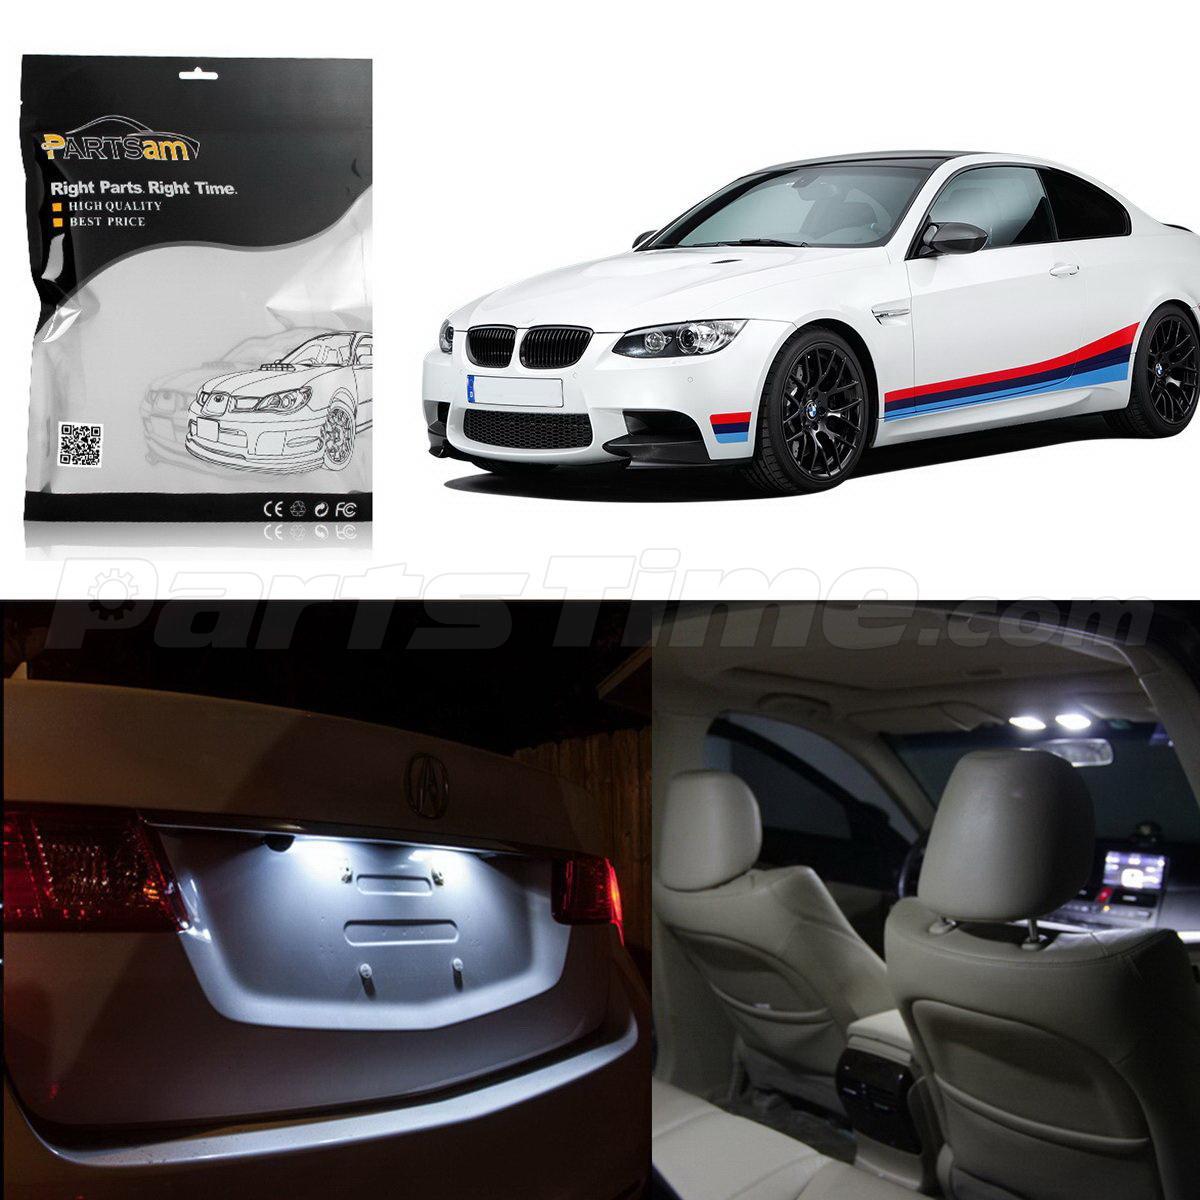 Bmw Xi 2006: 16x White Interior LED Package For BMW E46 1999-2006 Error